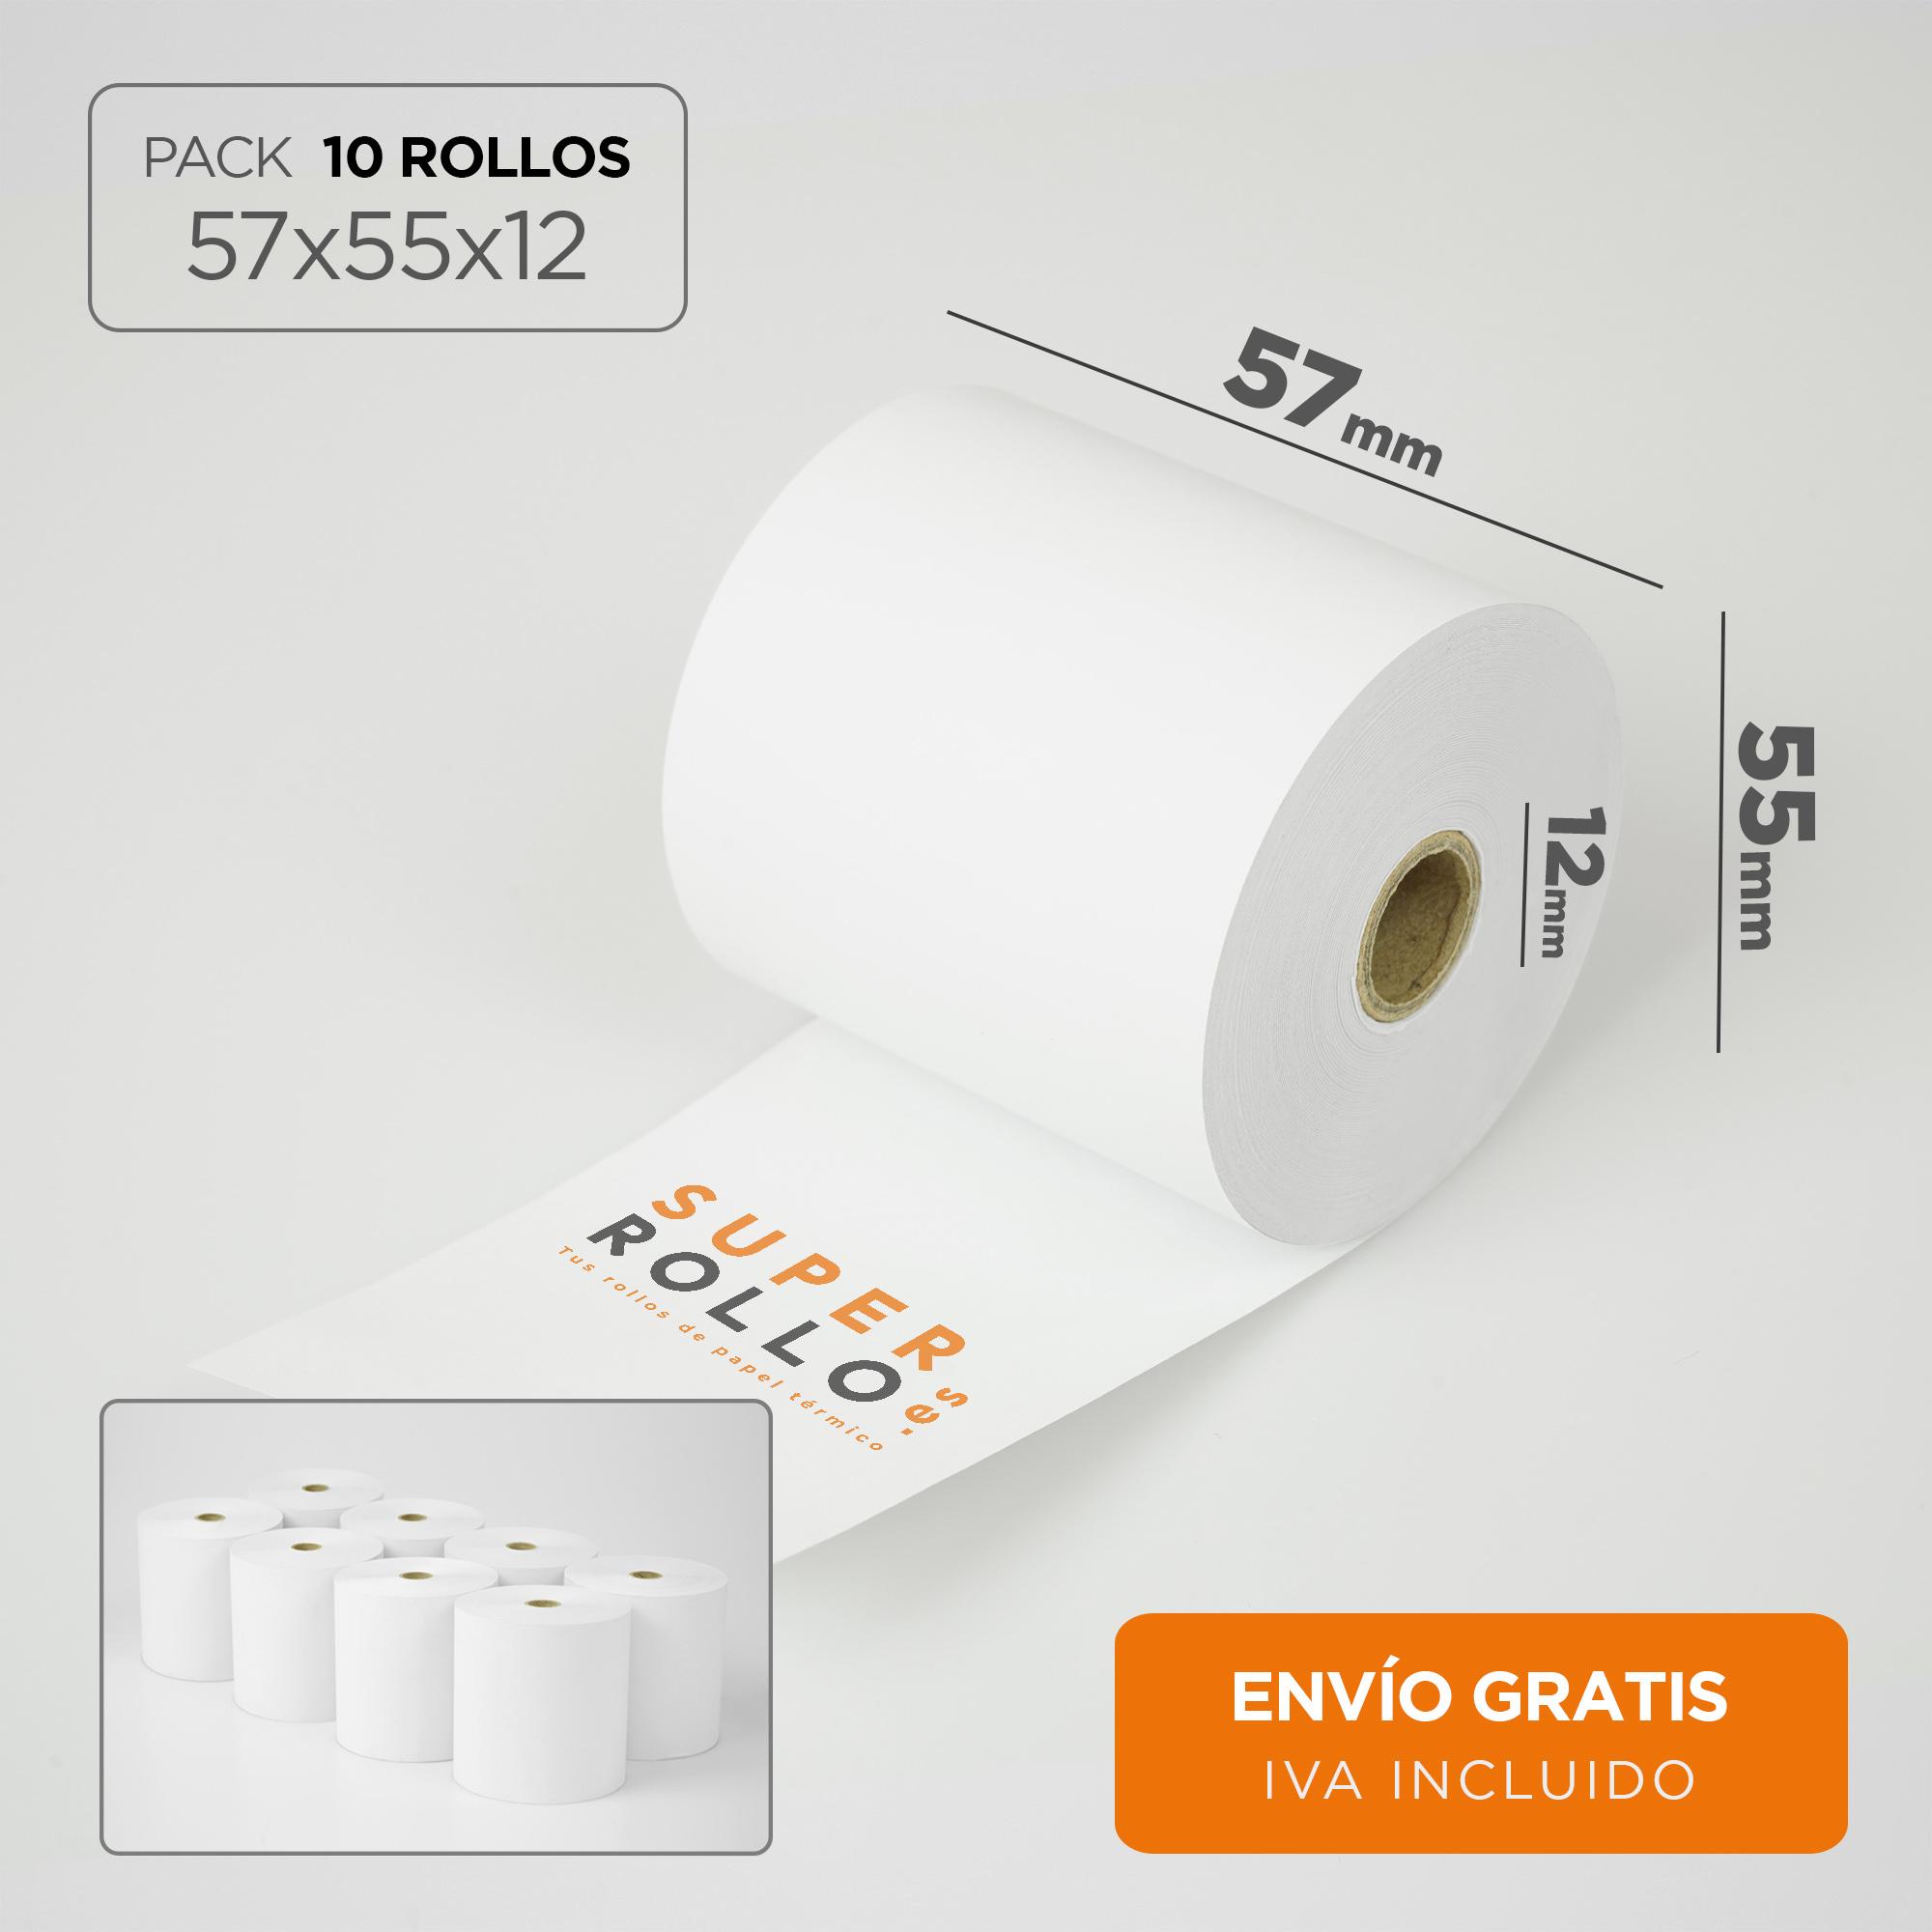 PACK_10_ROLLOS_57x55x12